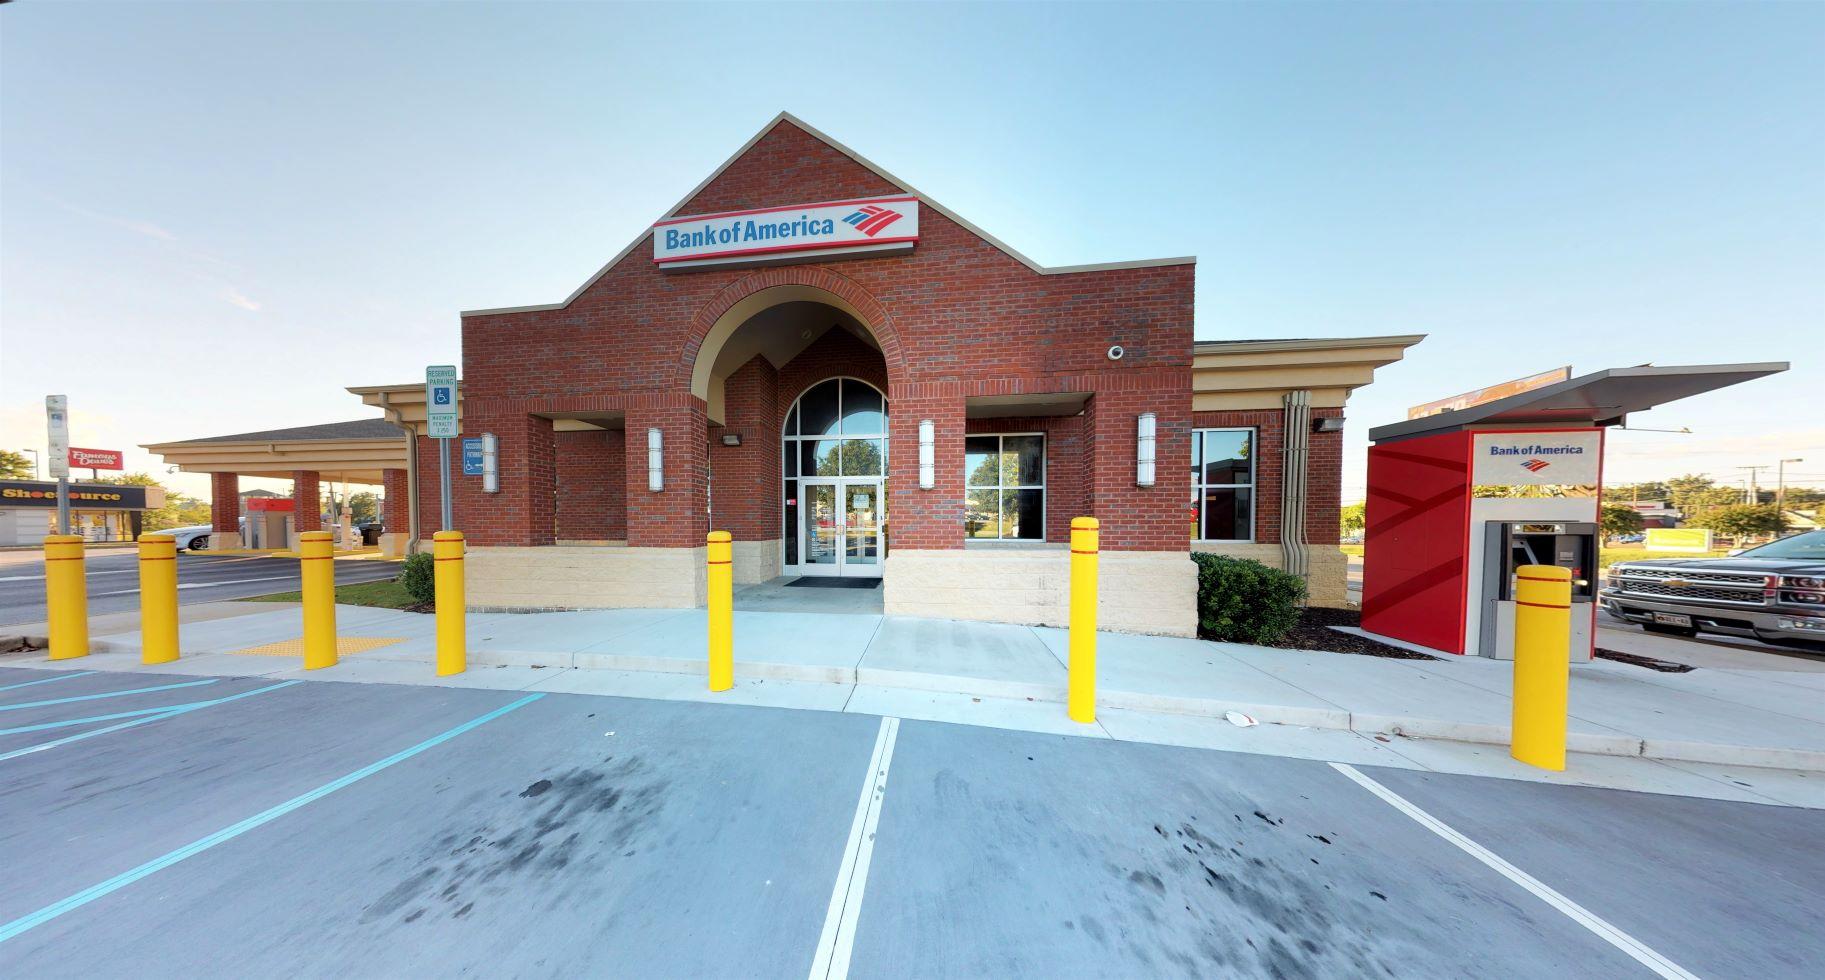 Bank of America financial center with drive-thru ATM and teller | 2126 Gunbarrel Rd, Chattanooga, TN 37421